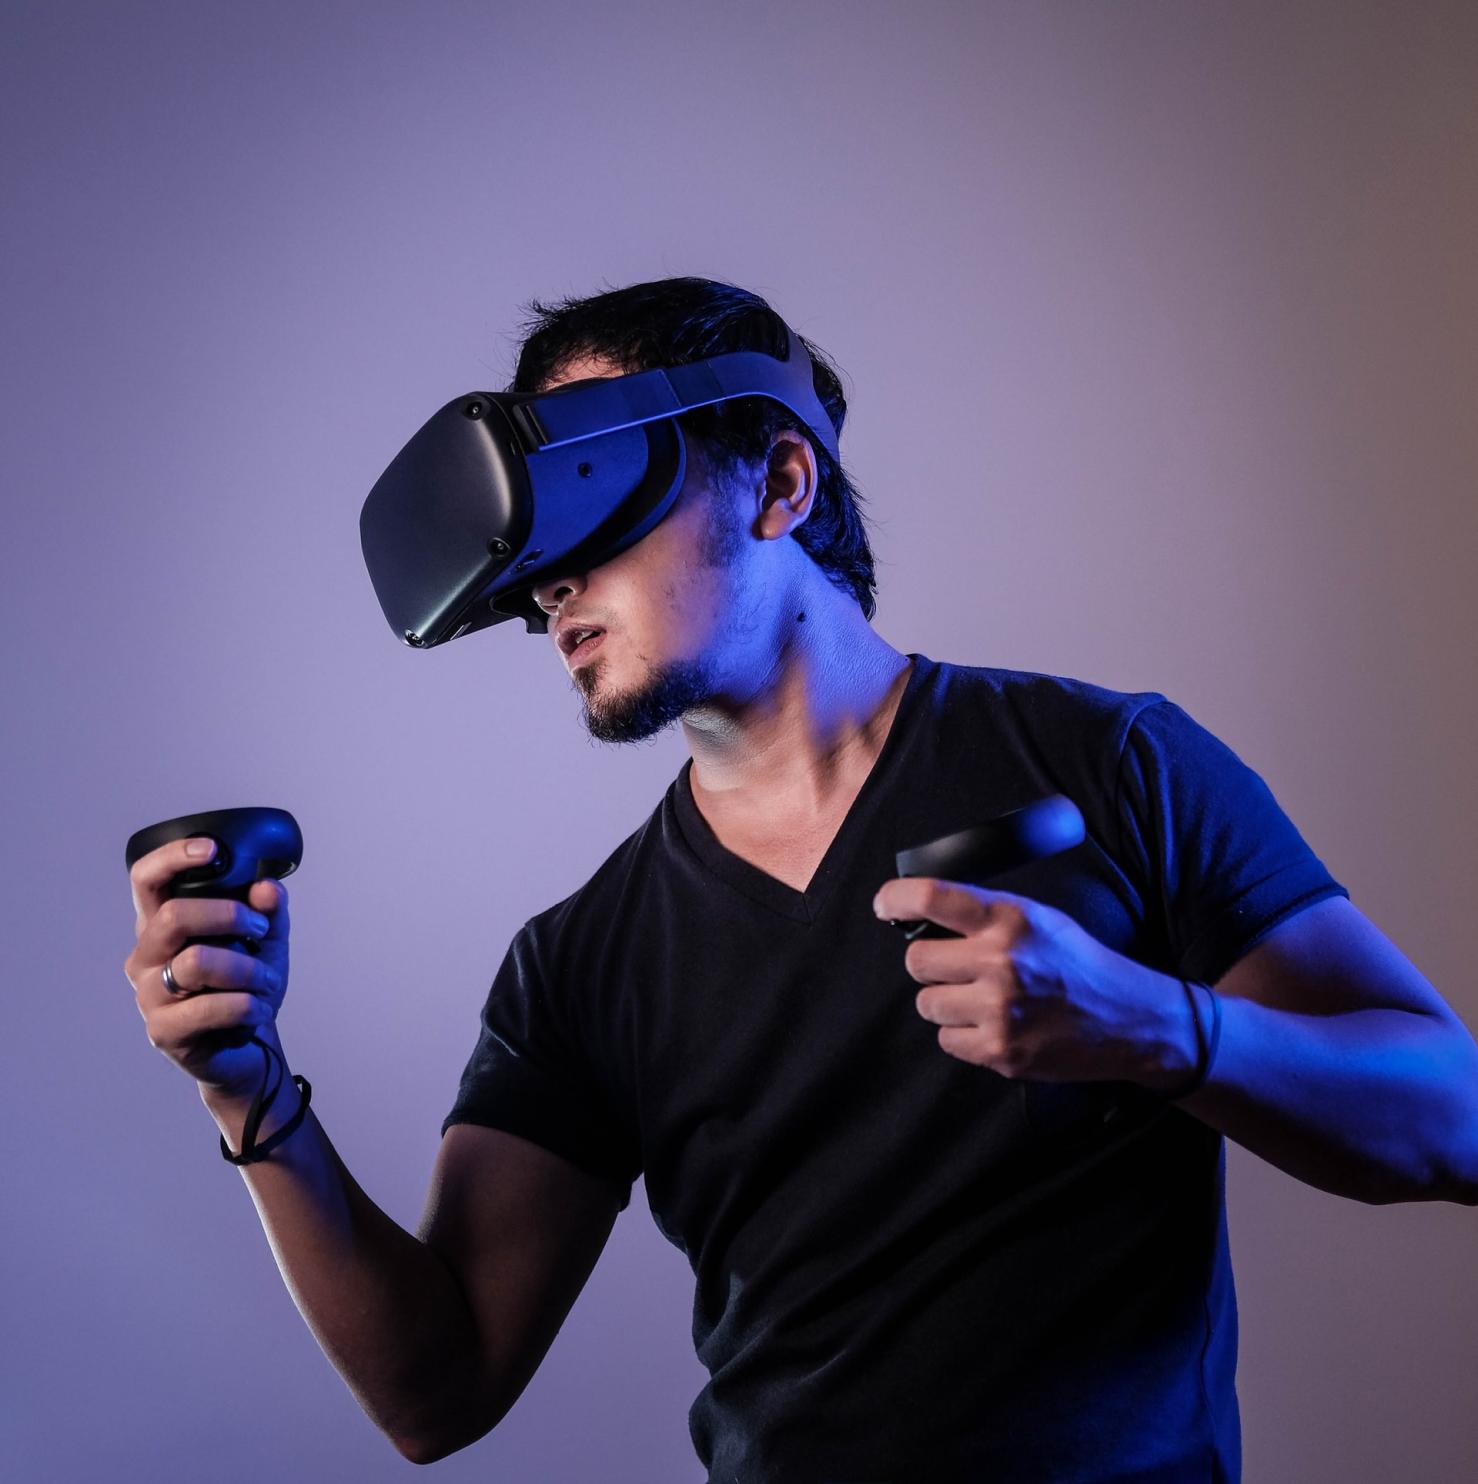 A photo of a man wearing a Virtual Reality headset playing a Virtual Reality game